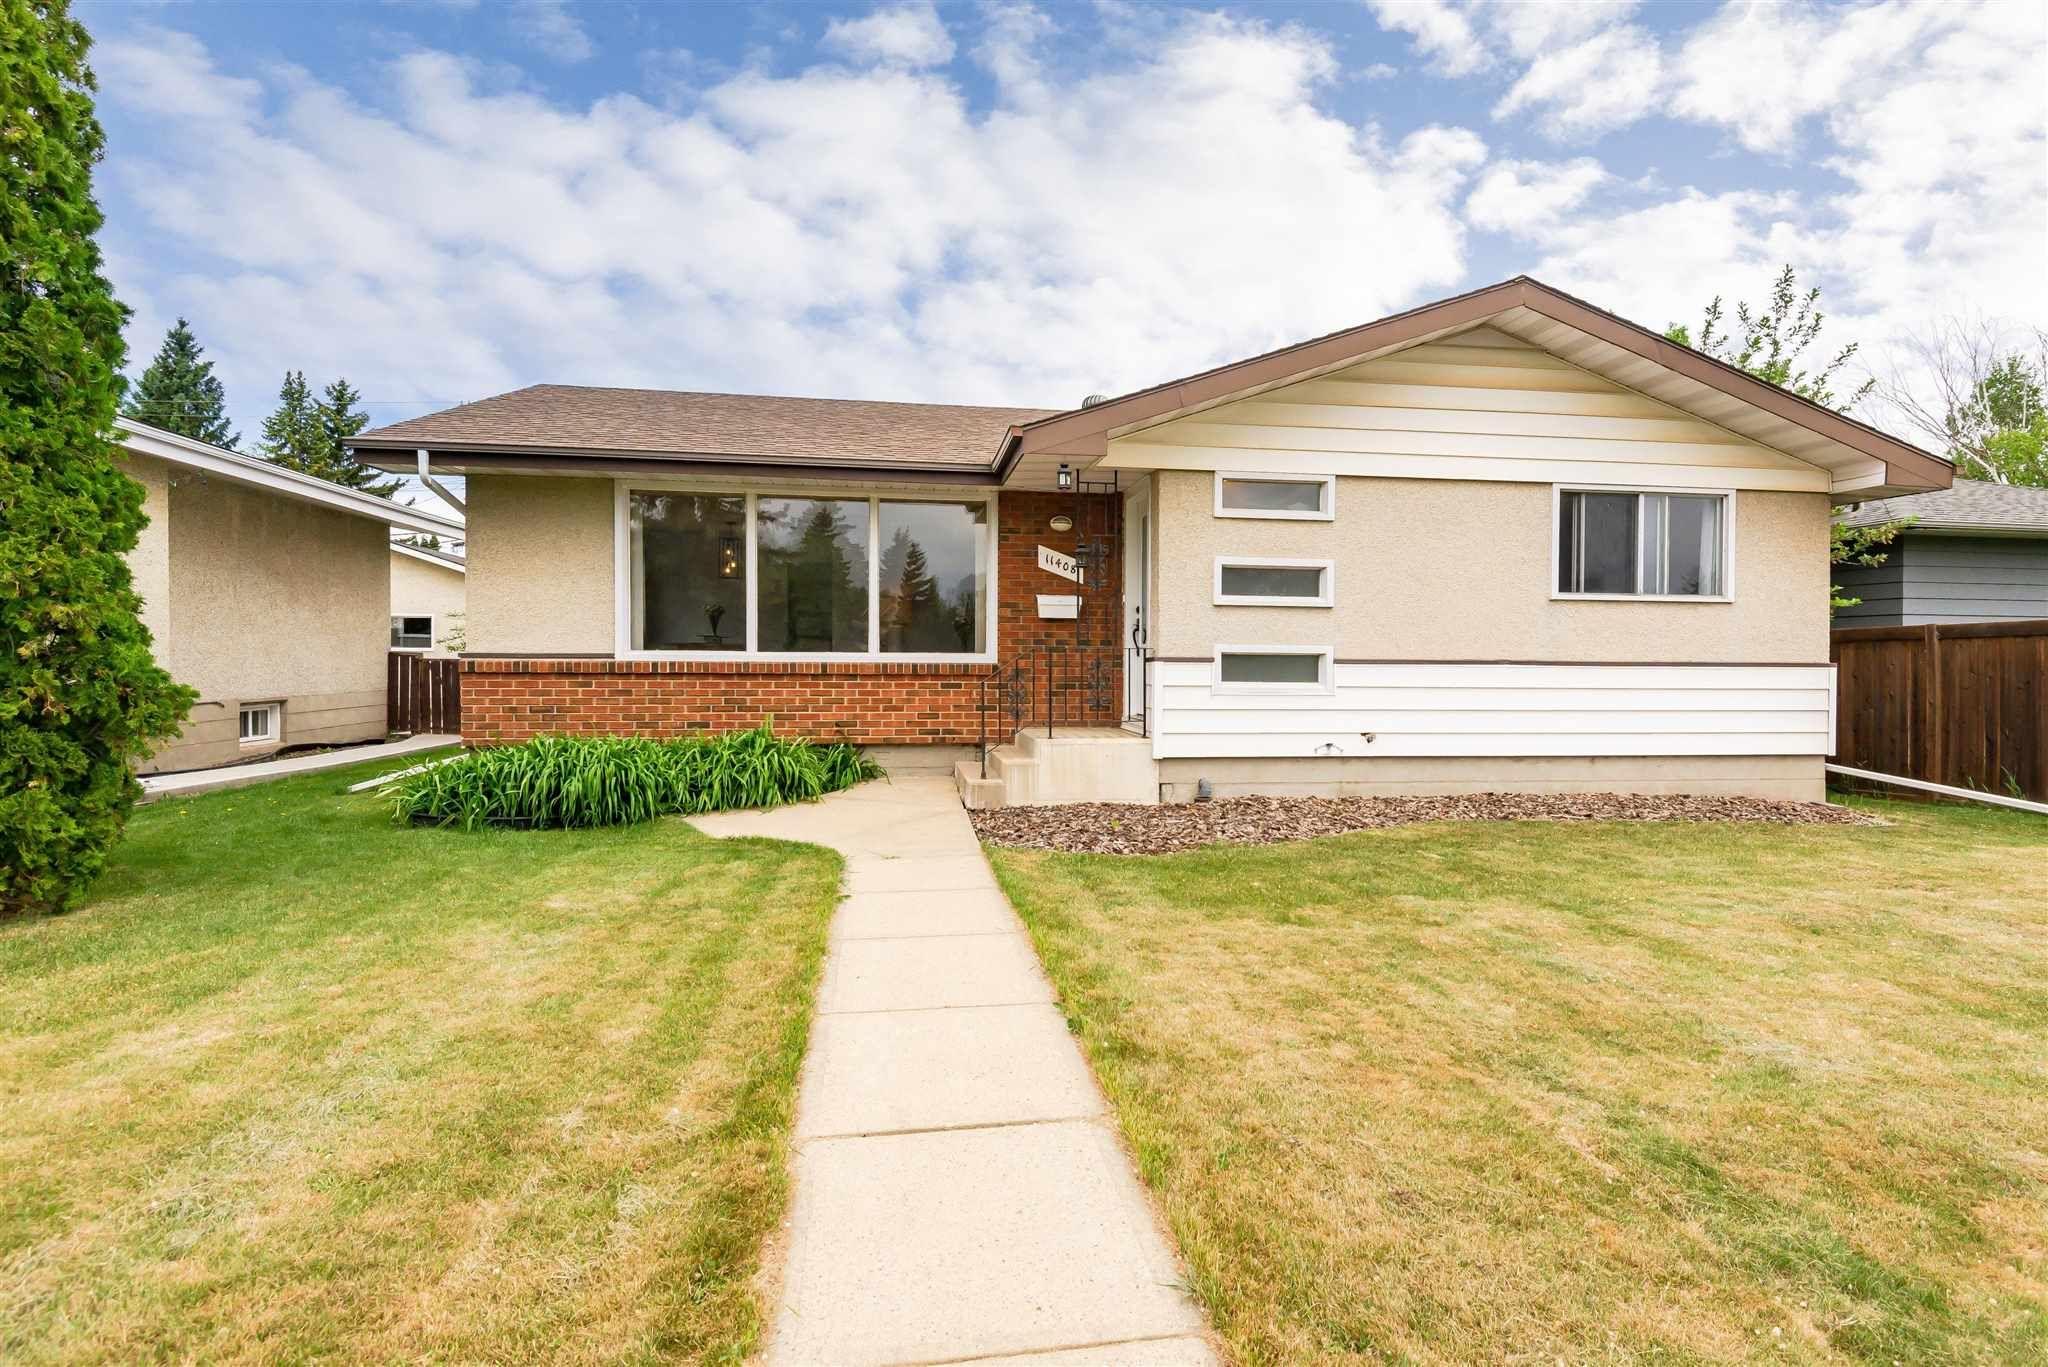 Main Photo: 11408 54A Avenue in Edmonton: Zone 15 House for sale : MLS®# E4248731